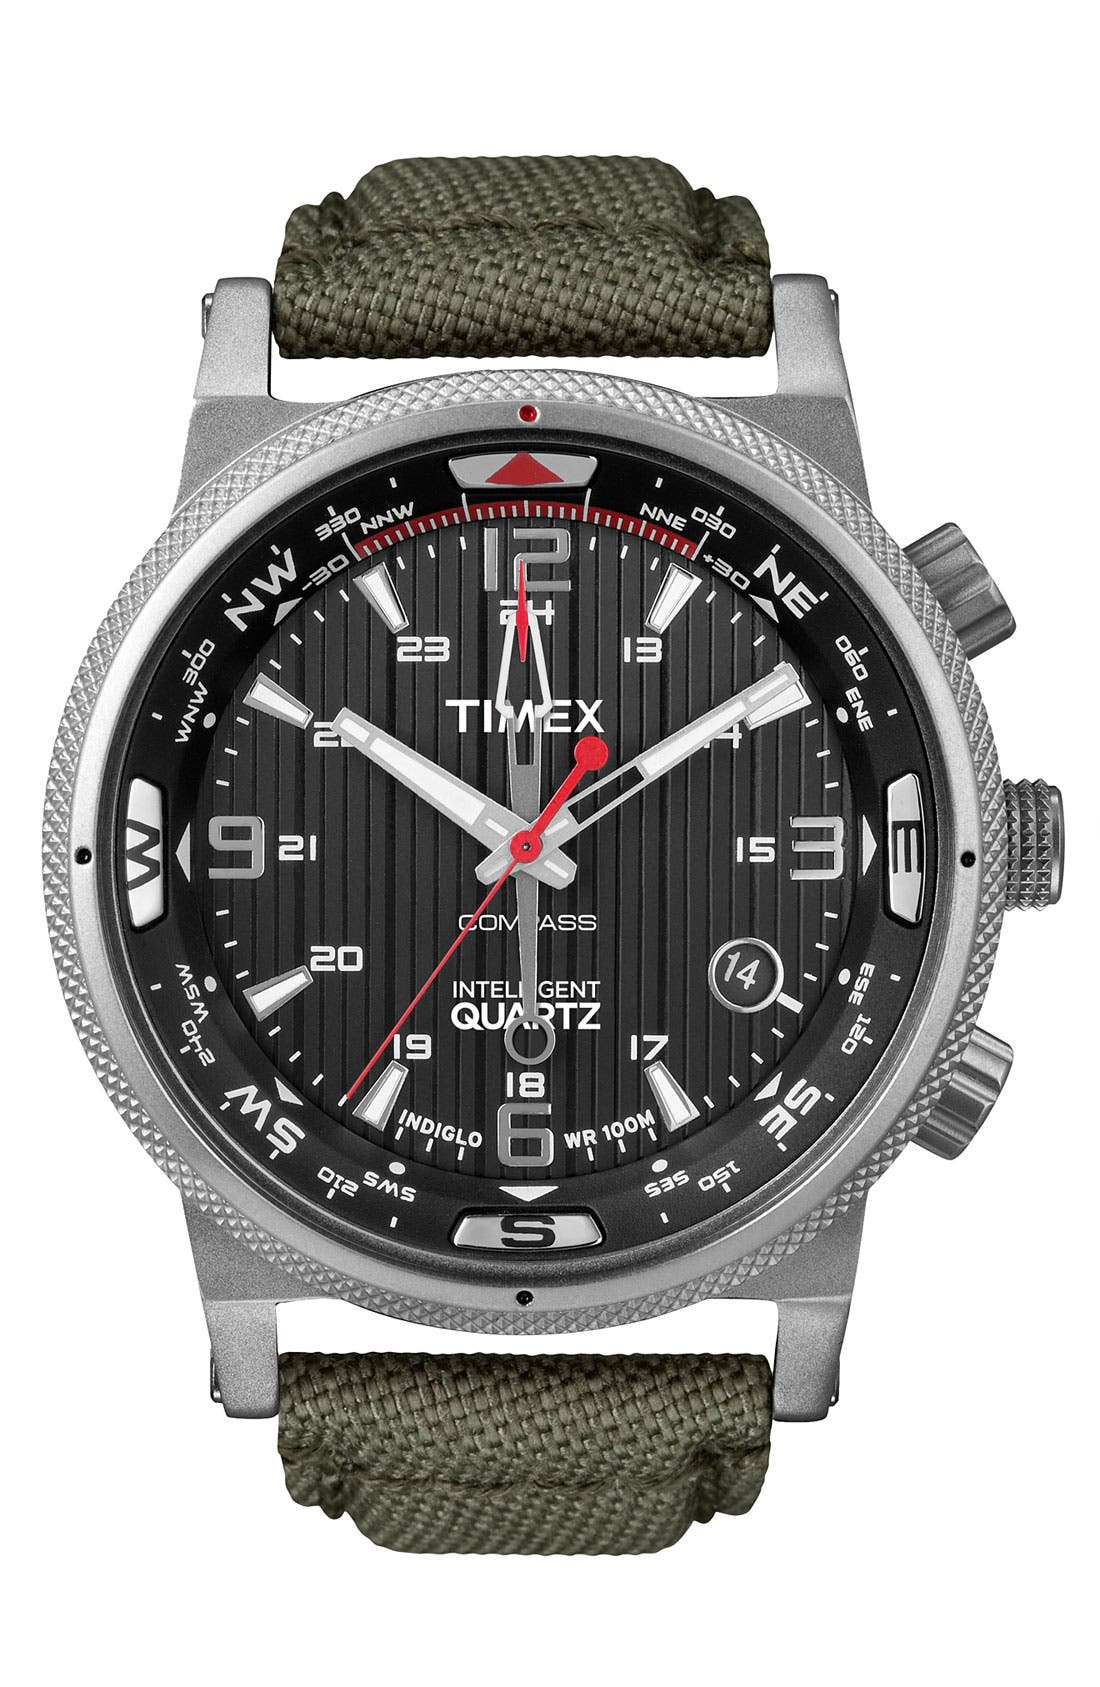 Alternate Image 1 Selected - Timex® 'Intelligent Quartz' Compass Dial Watch